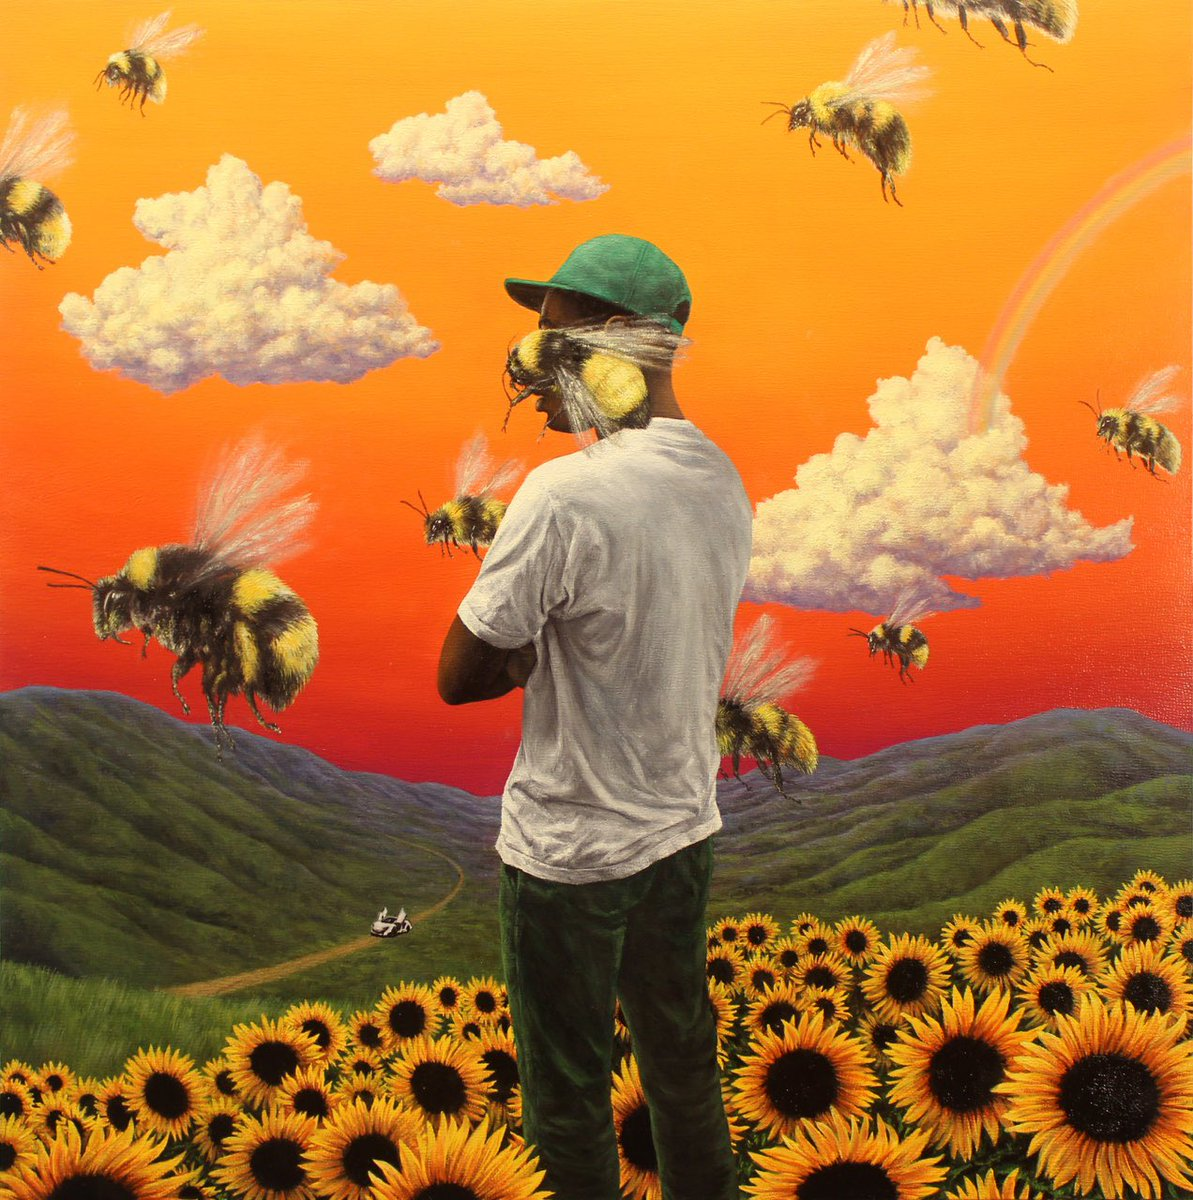 Tyler The Creator Speaks in Metaphors on New Album, 'Flower Boy'